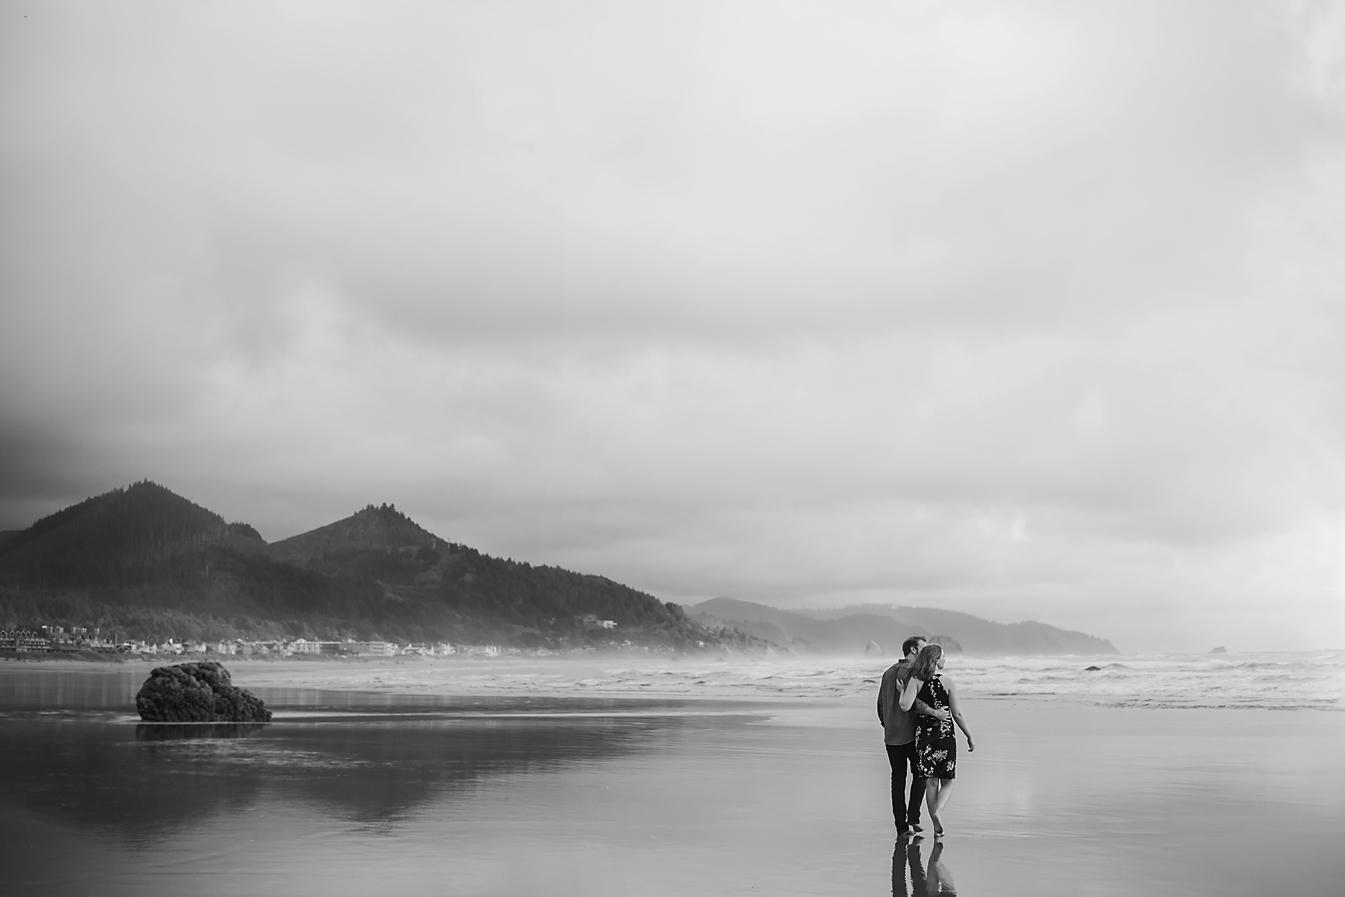 Amanda + Matt - Oregon Coast Elopement Photography - Oregon Cannon Beach Elopement Photographer - Emily & Co. Photography (1).jpg